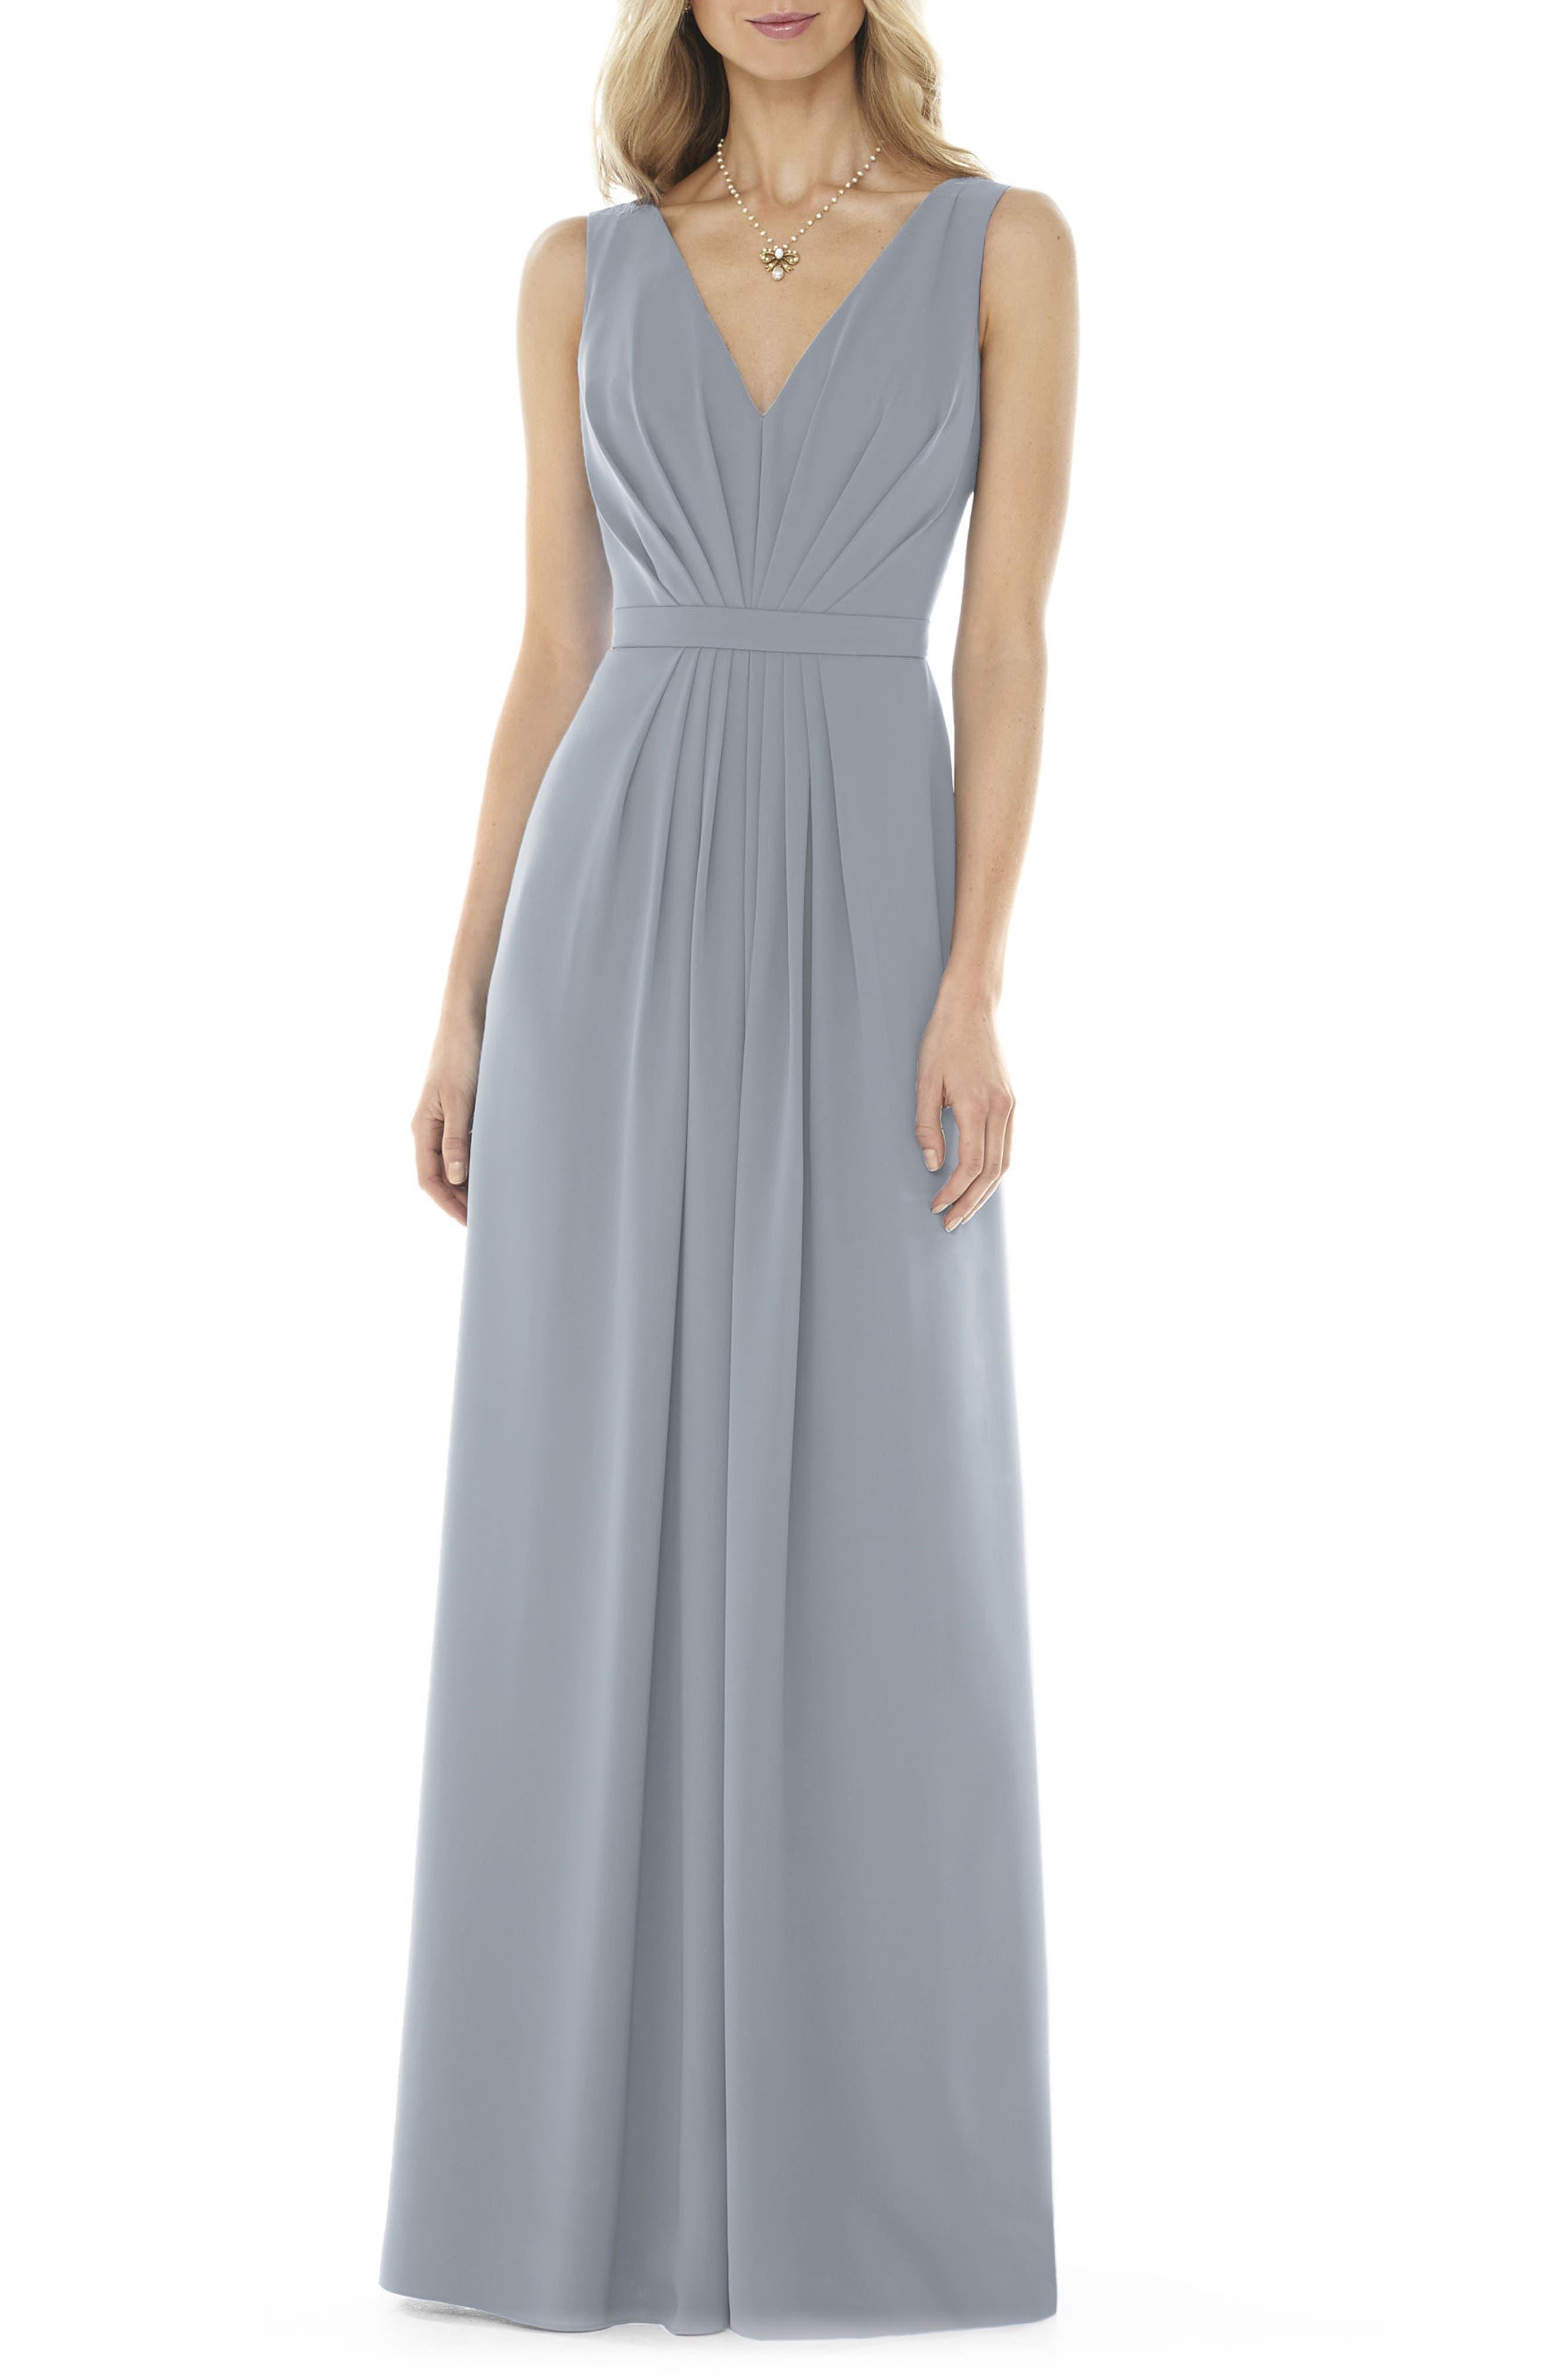 db31228d35c Women s Social Bridesmaids Dresses